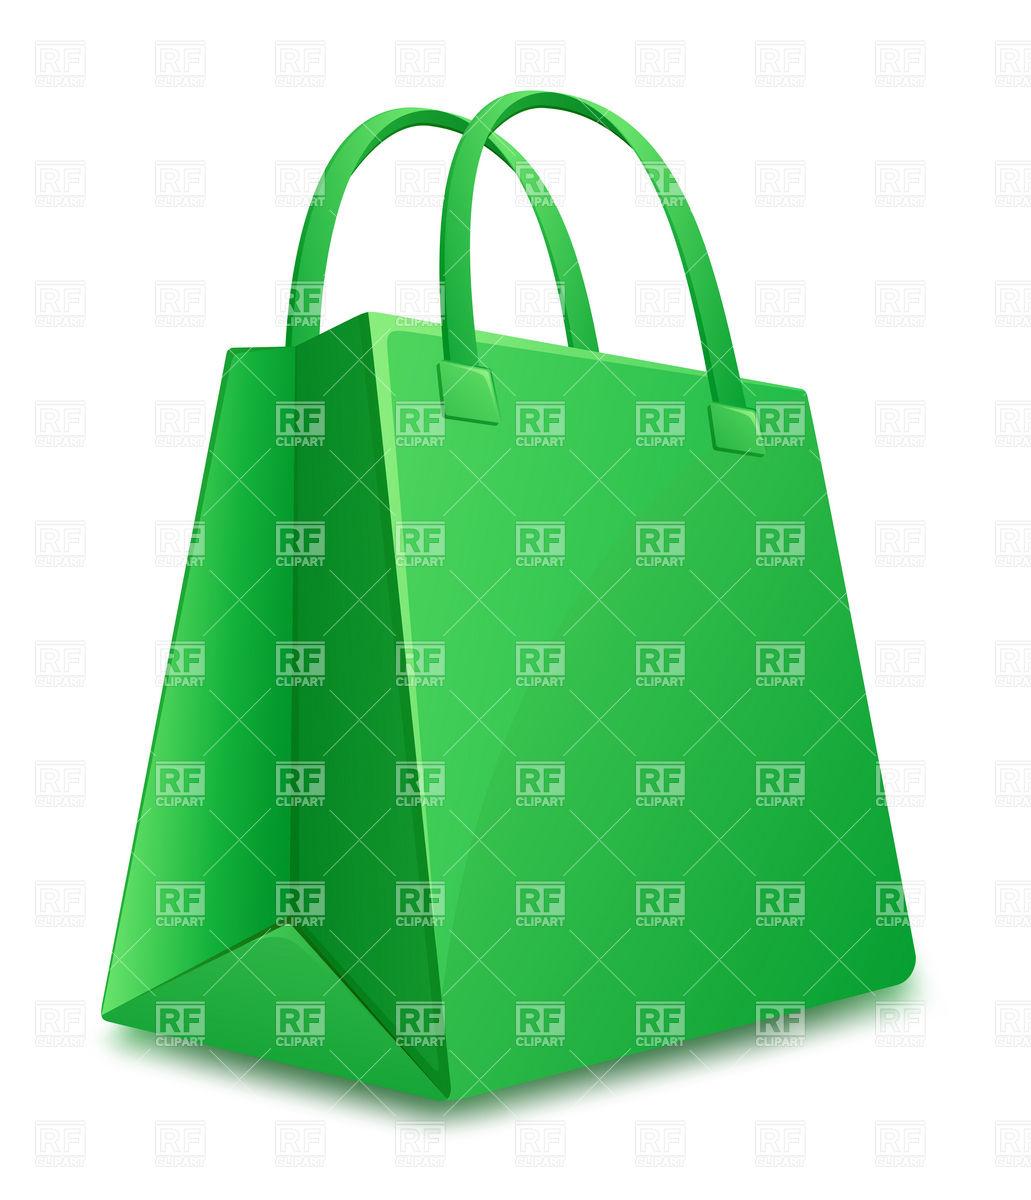 1031x1200 Green Shopping Bag Icon Royalty Free Vector Clip Art Image